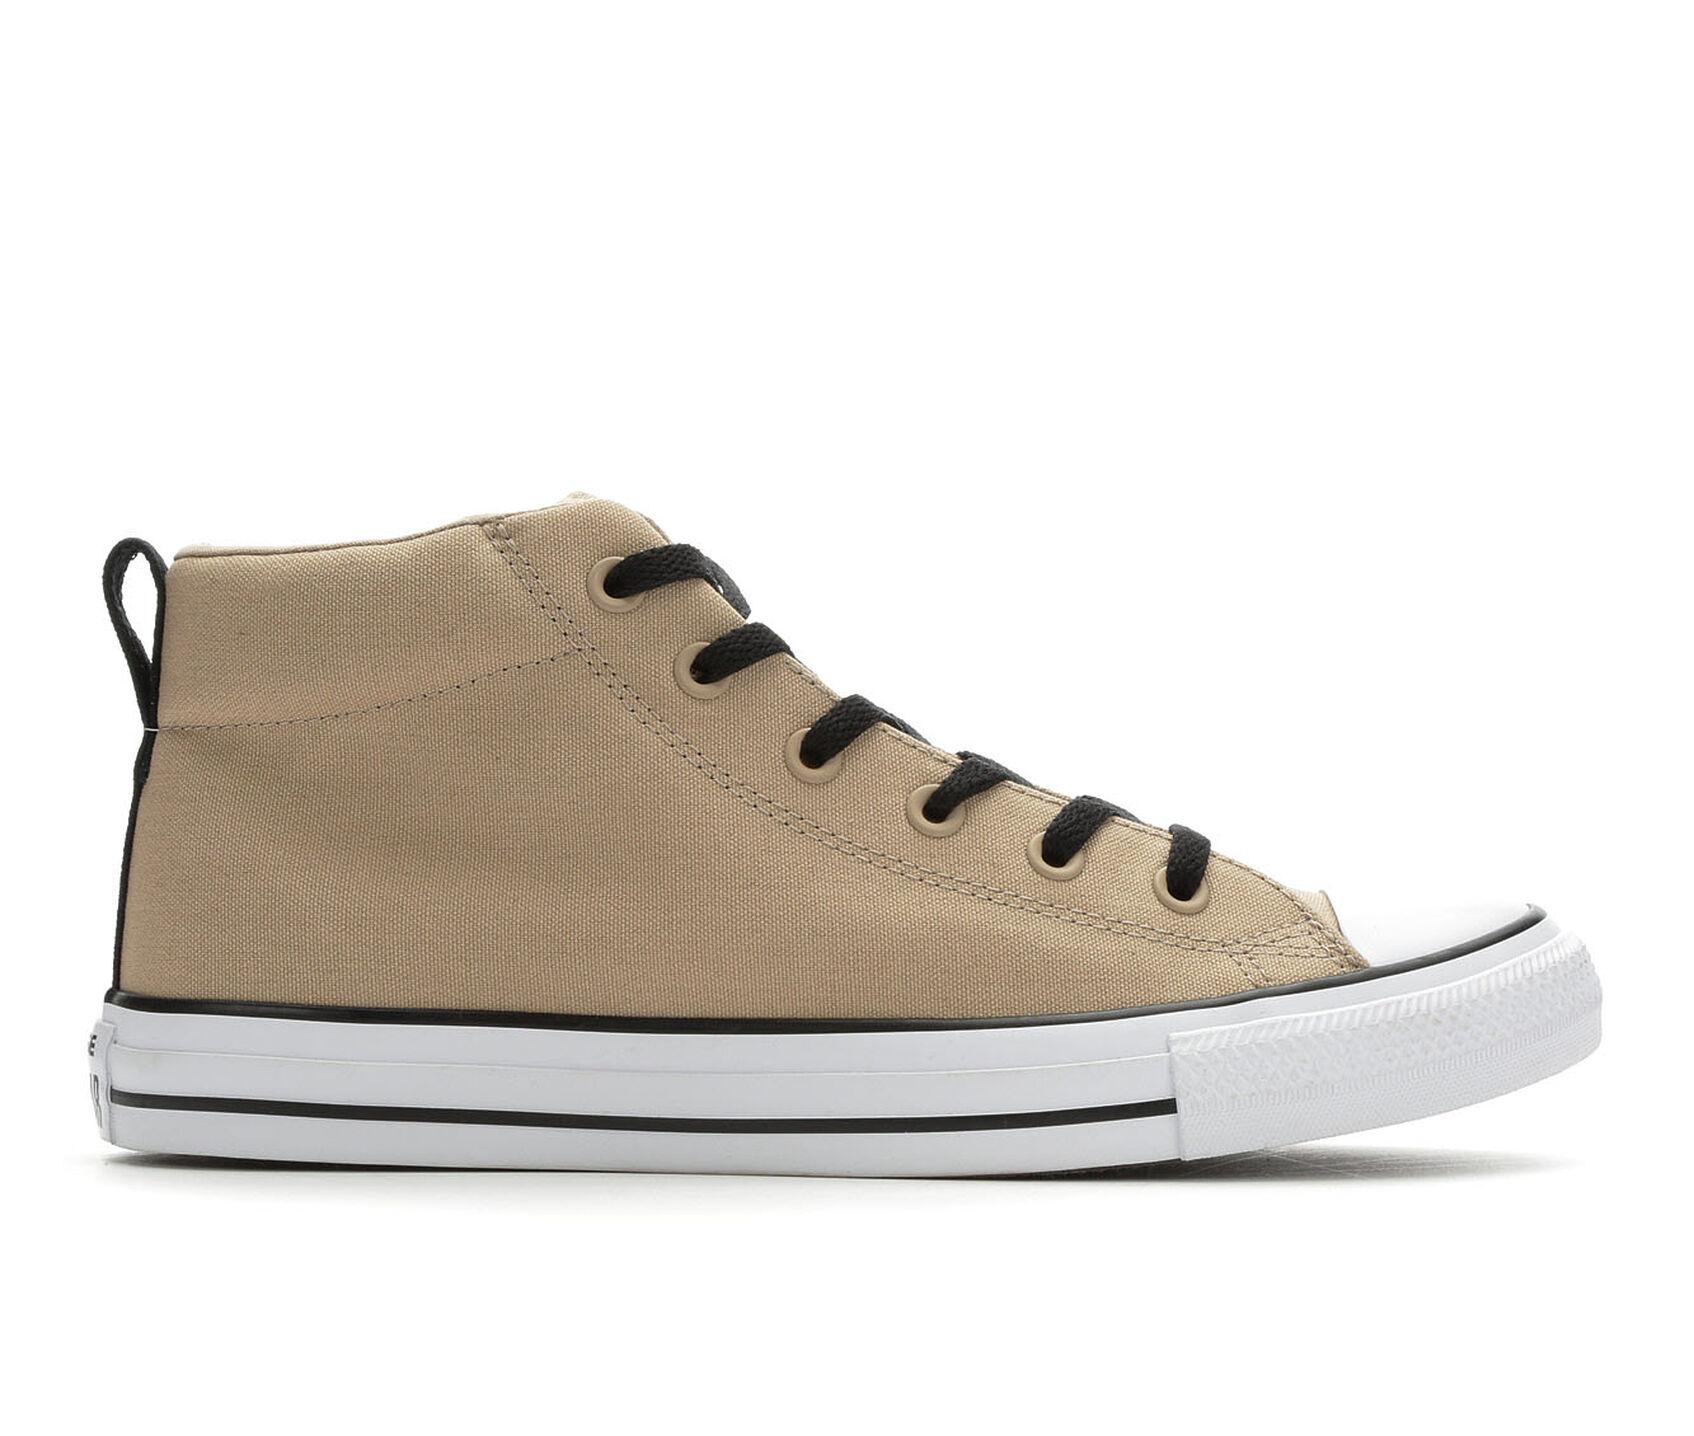 High Top Converse Shoe Carnival